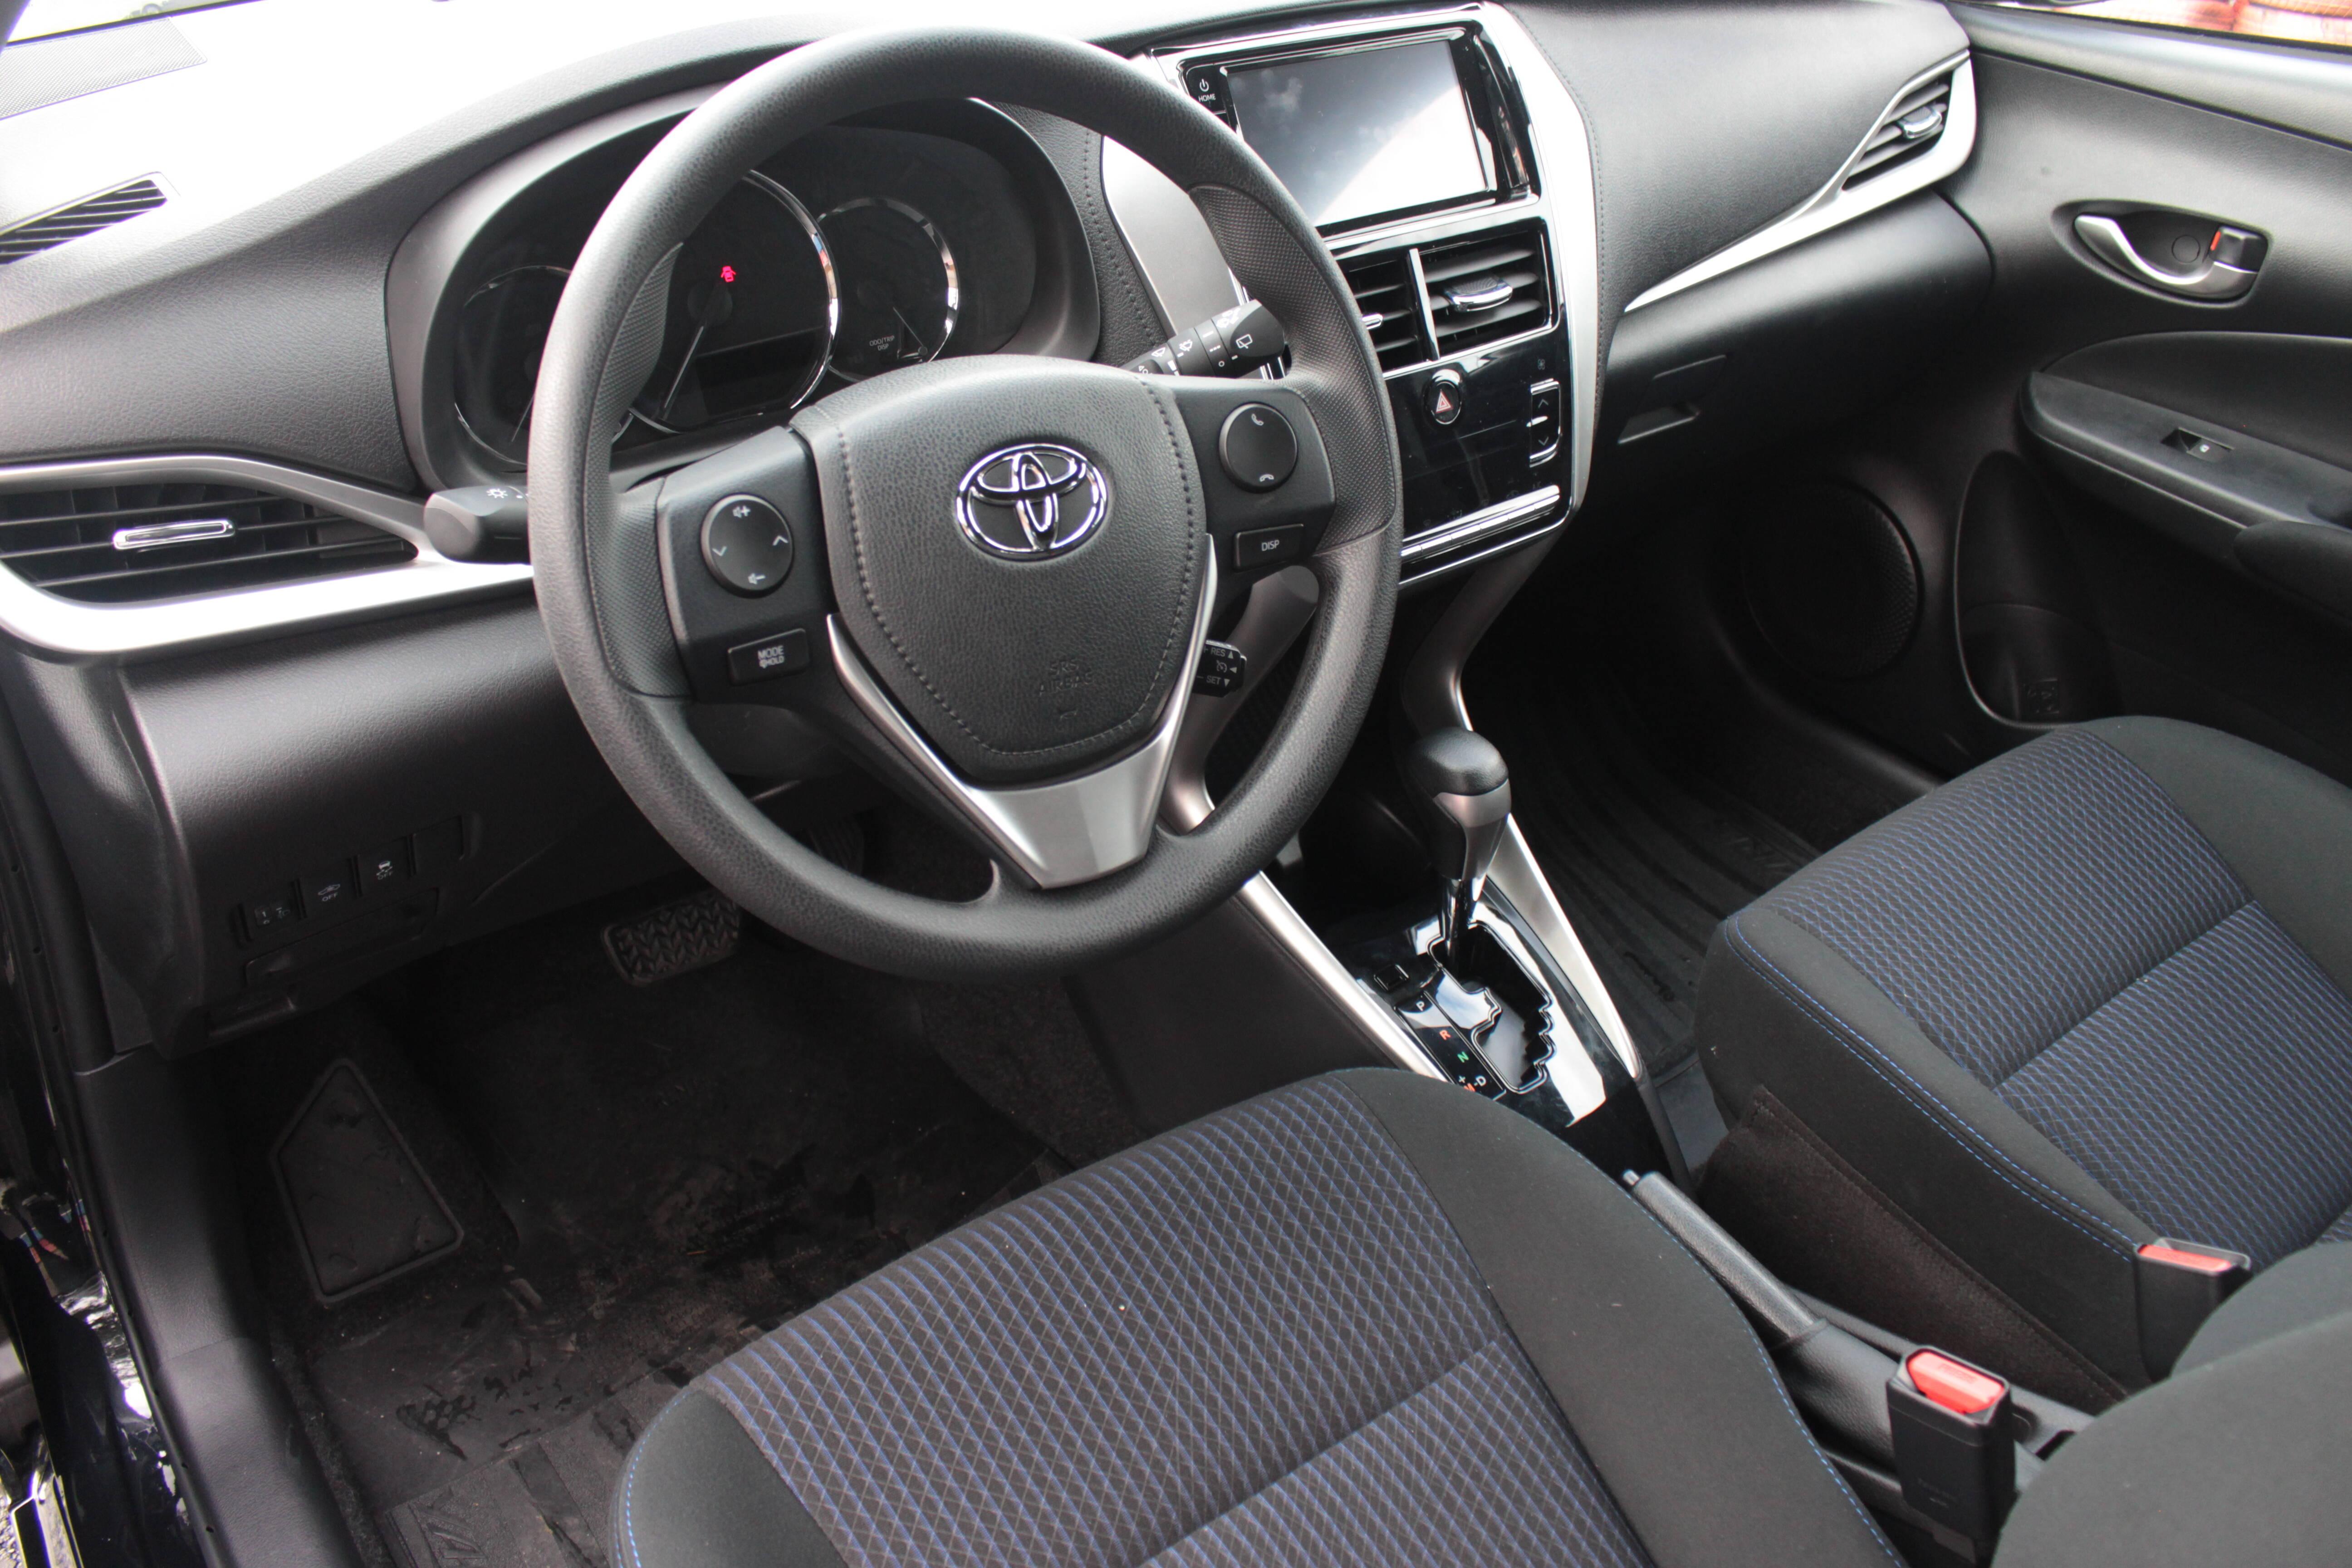 Toyota Yaris 1.3 CVT. Foto: Cauê Lira/iG Carros